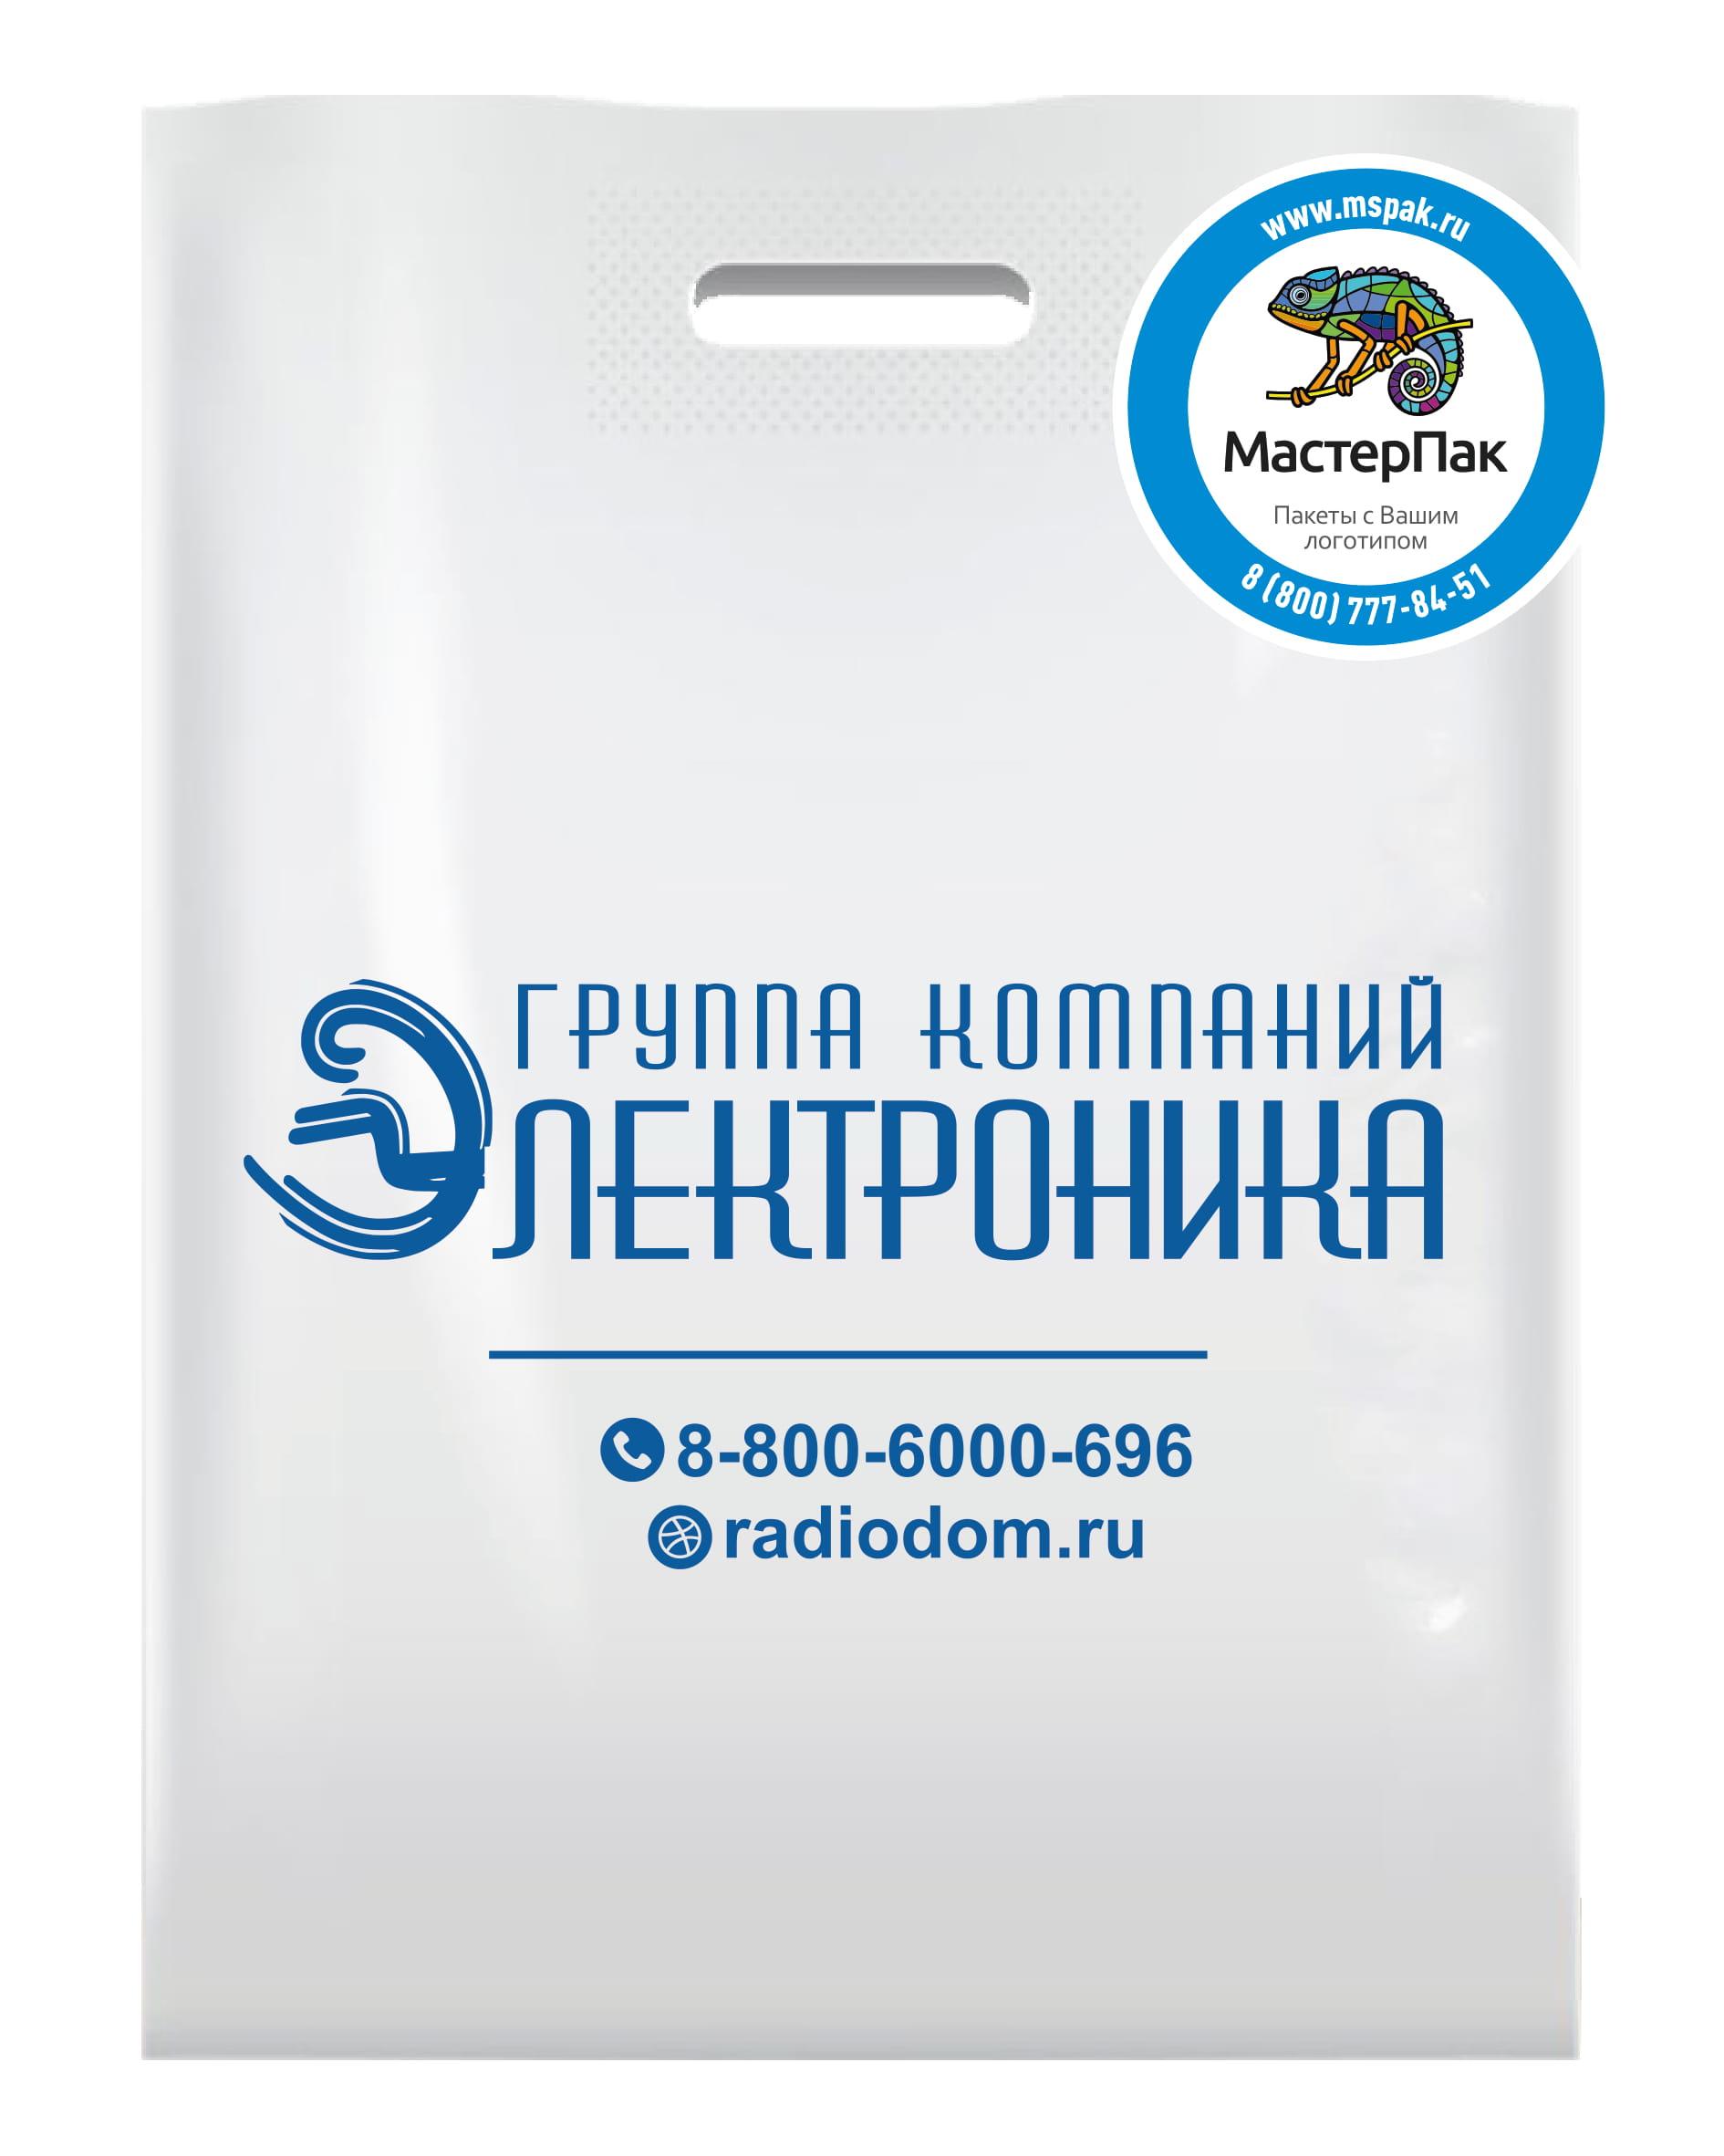 Пакет ПВД с логотипом Группа компаний Электроника, 70 мкм, 30*40